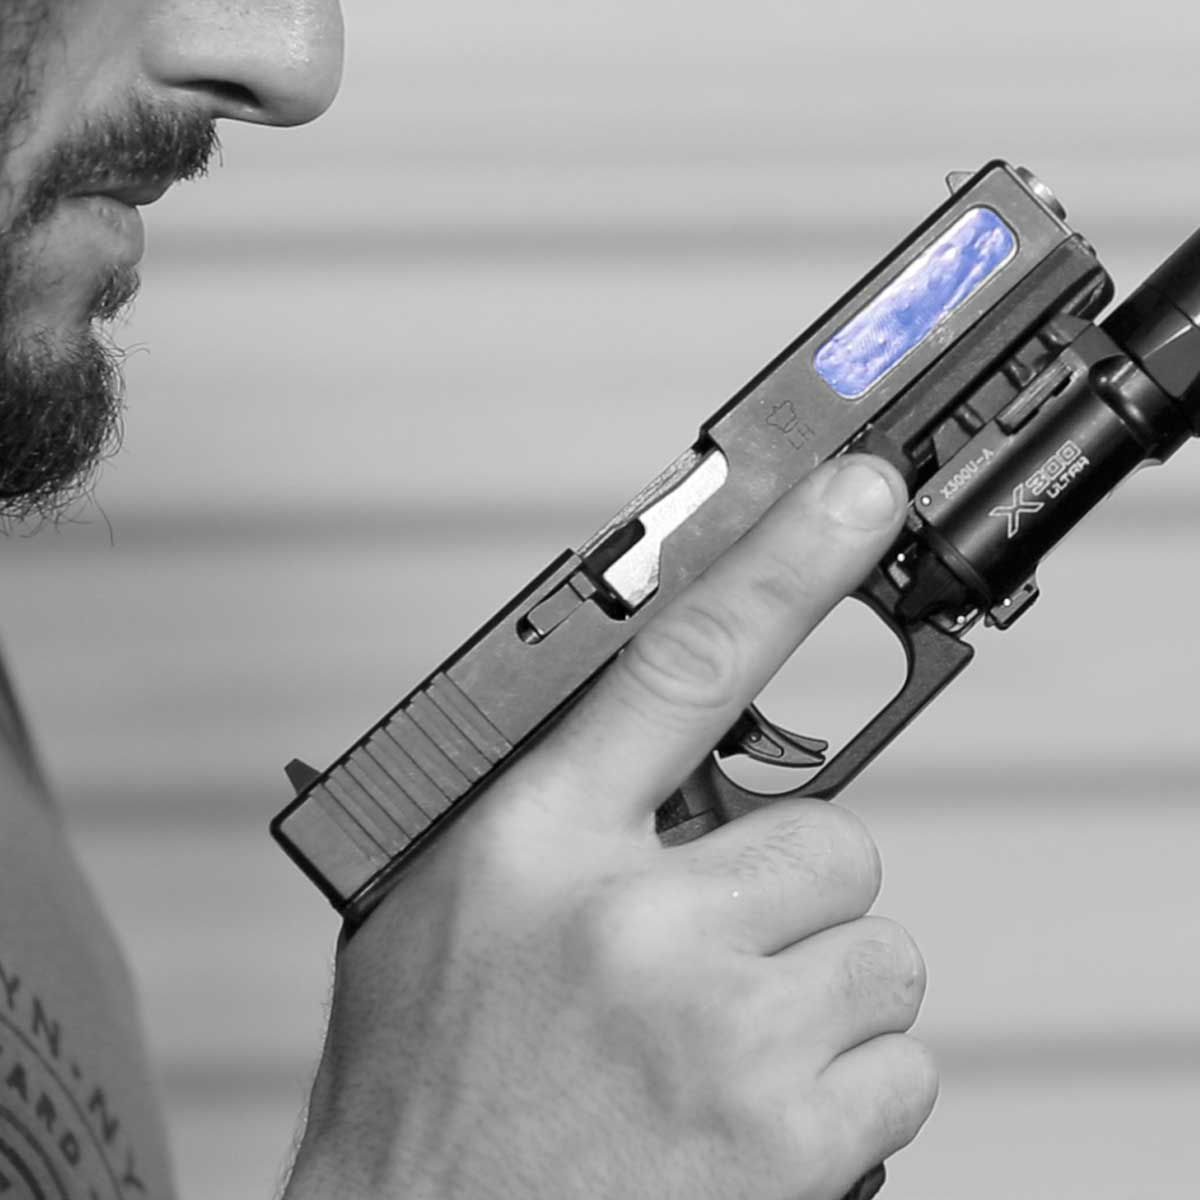 Pistol & Rifle Performance - Spartan Development Group